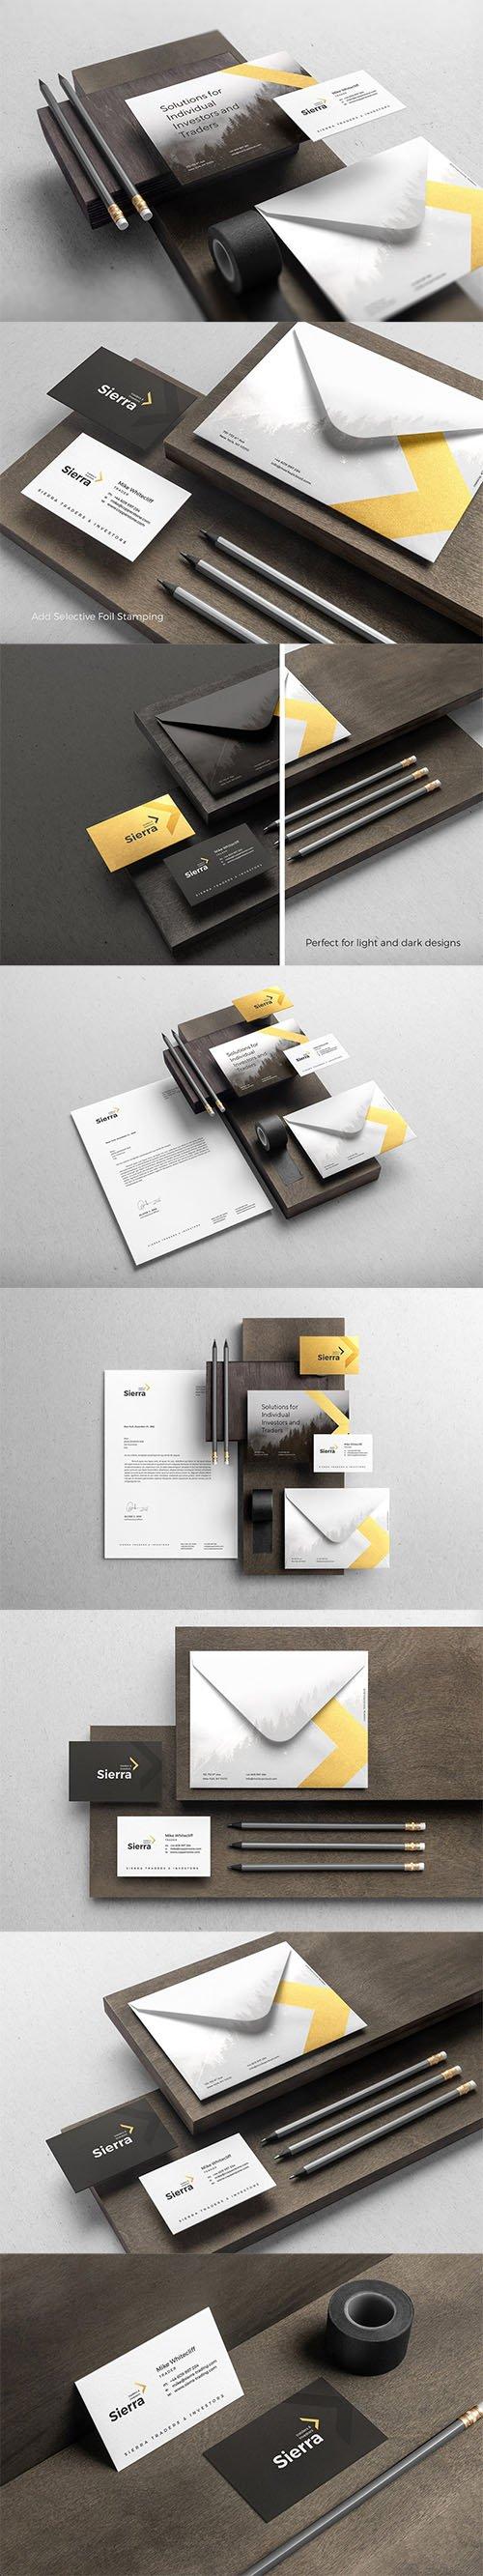 Sierra Branding Mockup Vol. 1 PSD